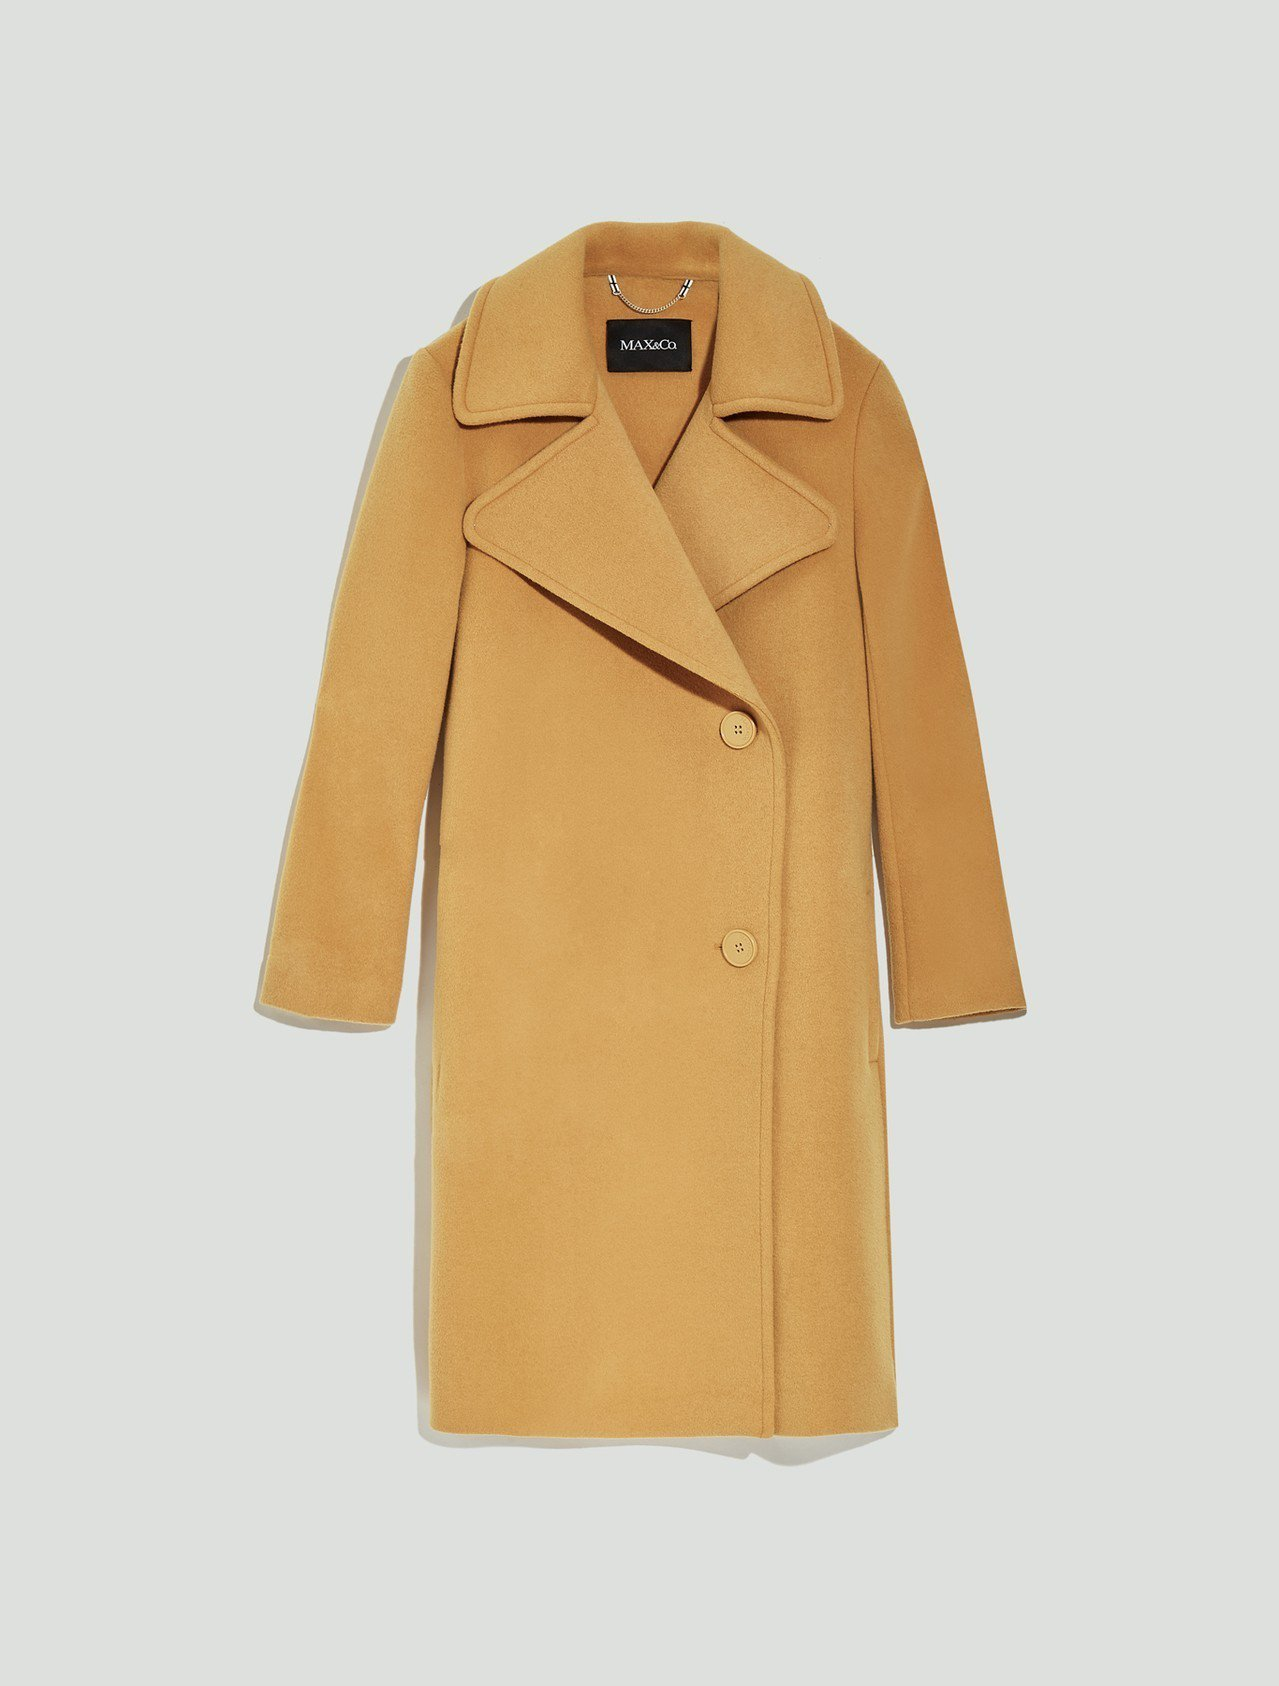 MAX&Co.2018秋冬系列芥末黃翻領大衣34,200元。圖/華敦提供